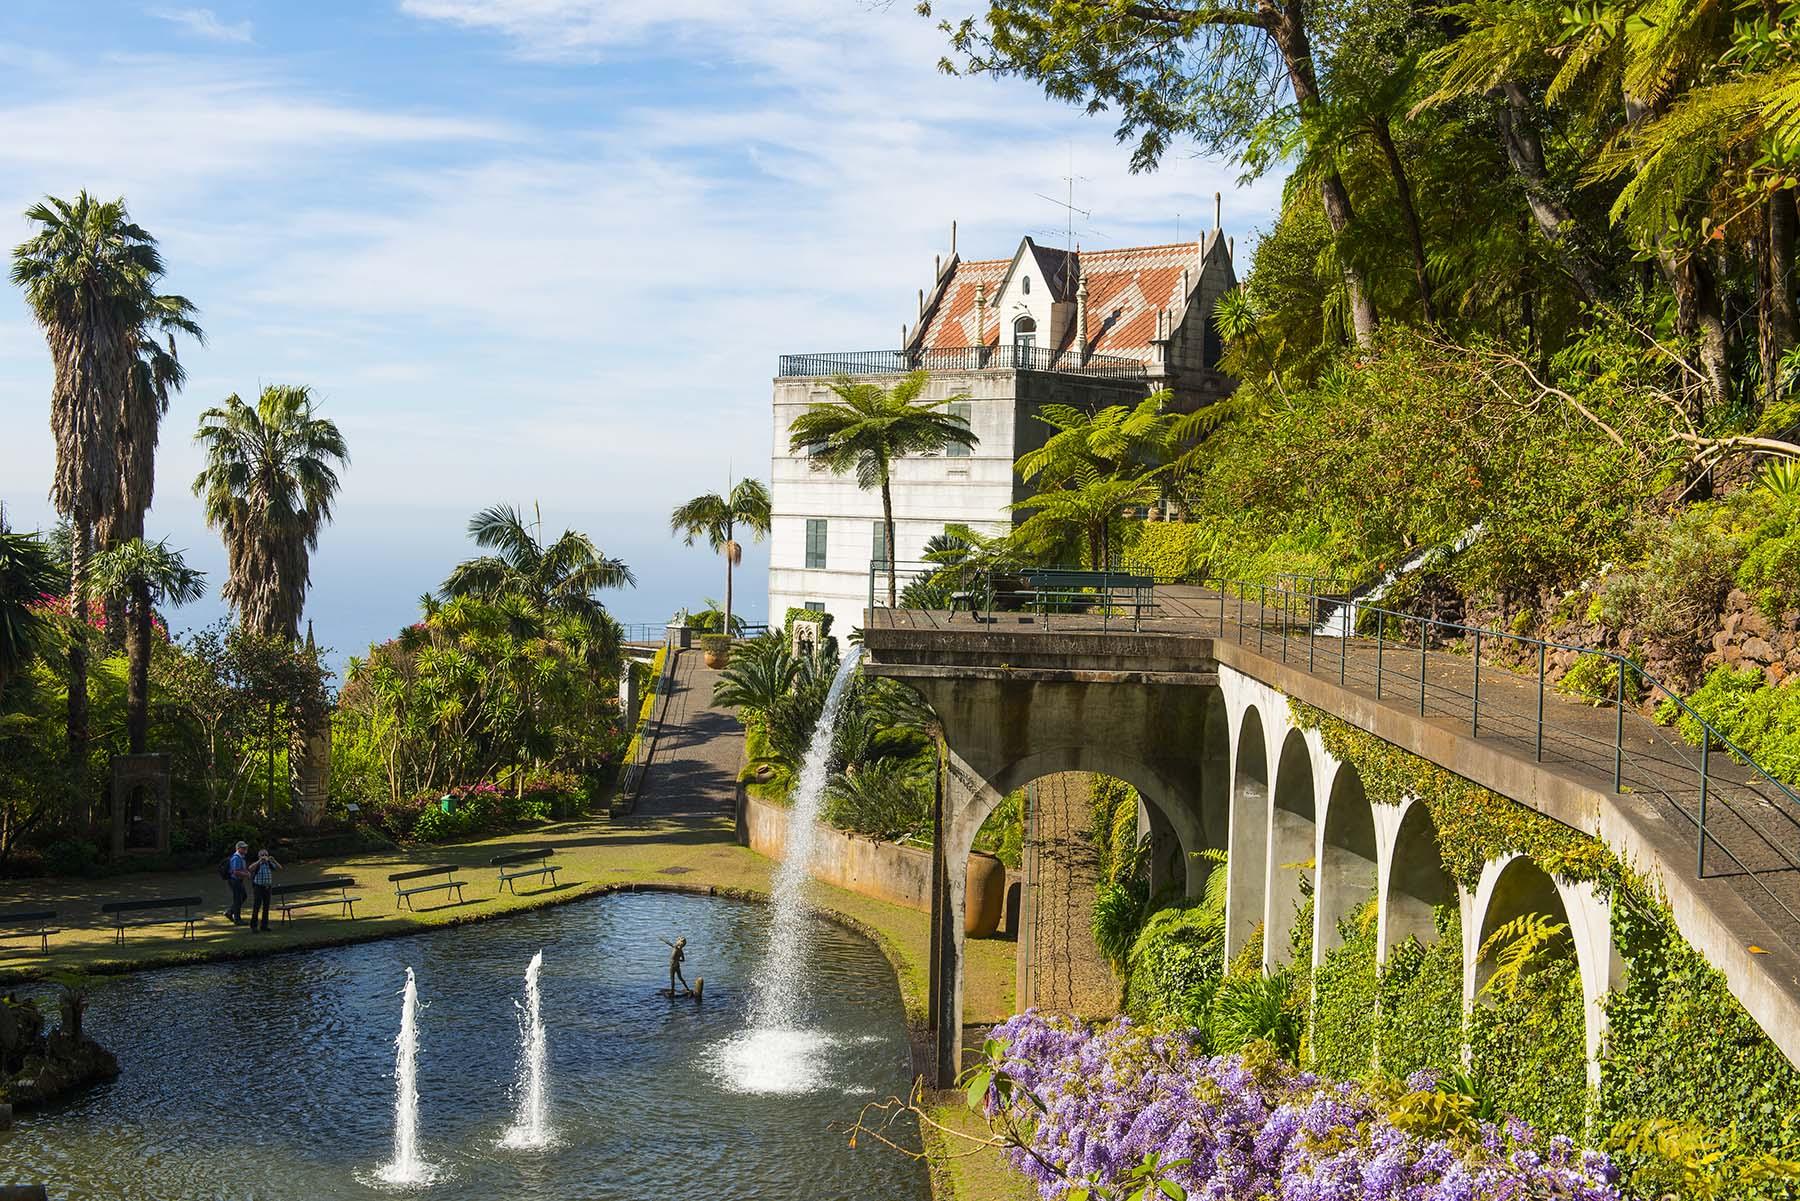 TZ: Sicheres Reiseziel Insel Madeira